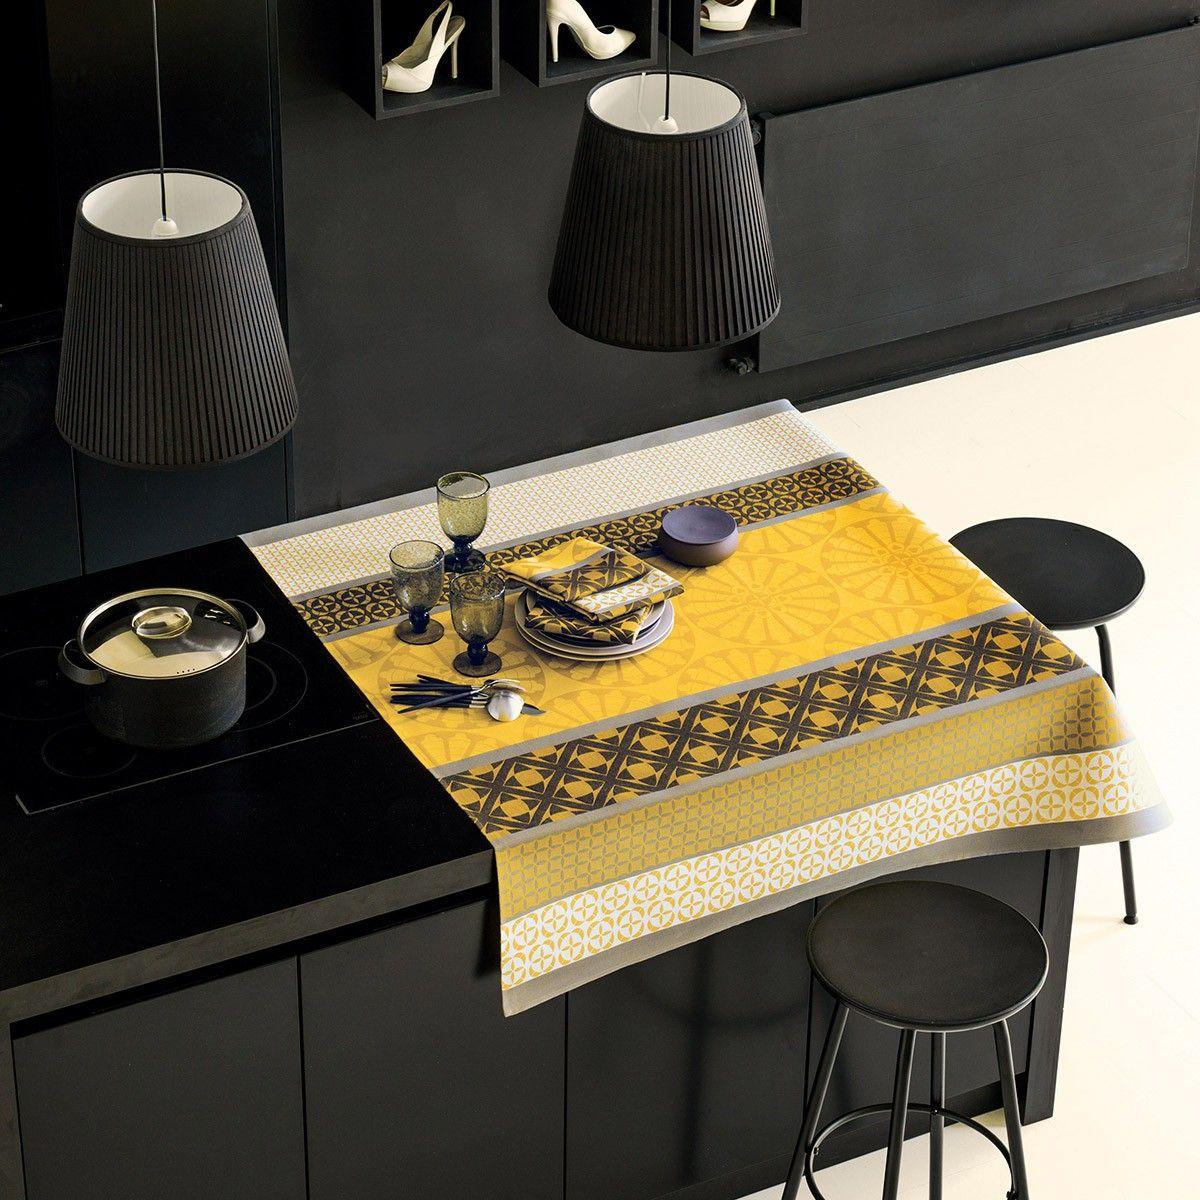 Nappe enduite Bilbao Acacia 100% coton - Nappes - La Table - Le Jacquard Français